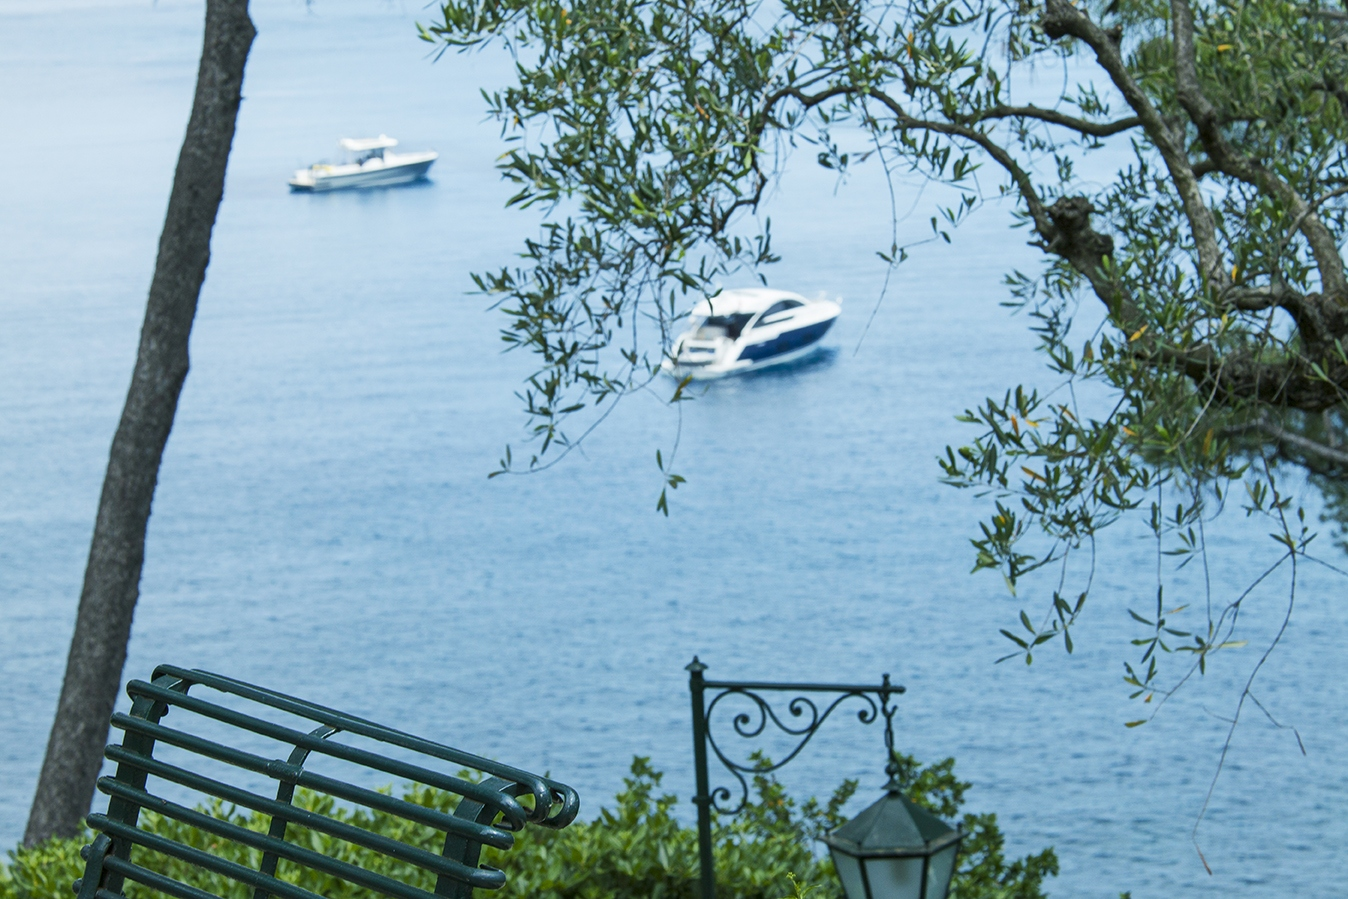 Villa in Vendita a Santa Margherita Ligure: 5 locali, 580 mq - Foto 2